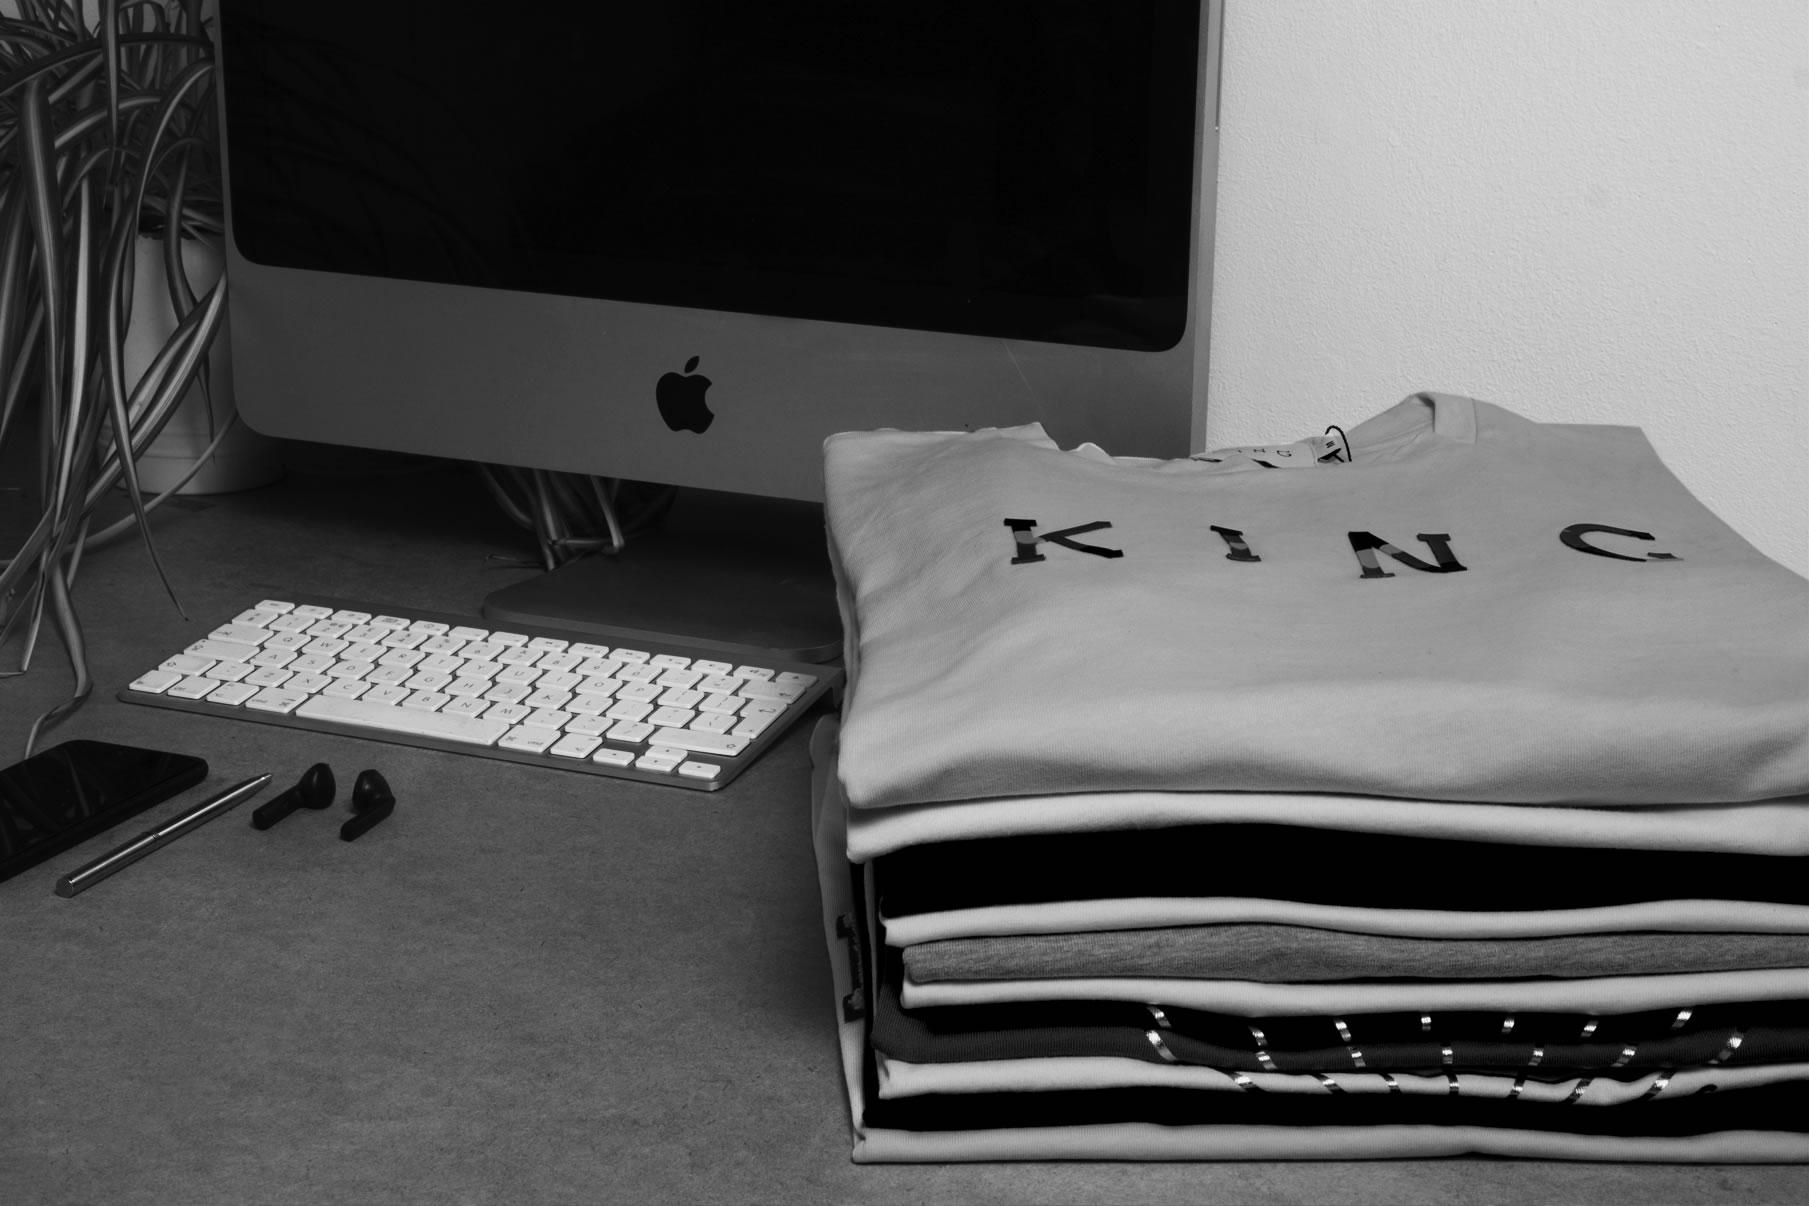 King Apparel T-shirts